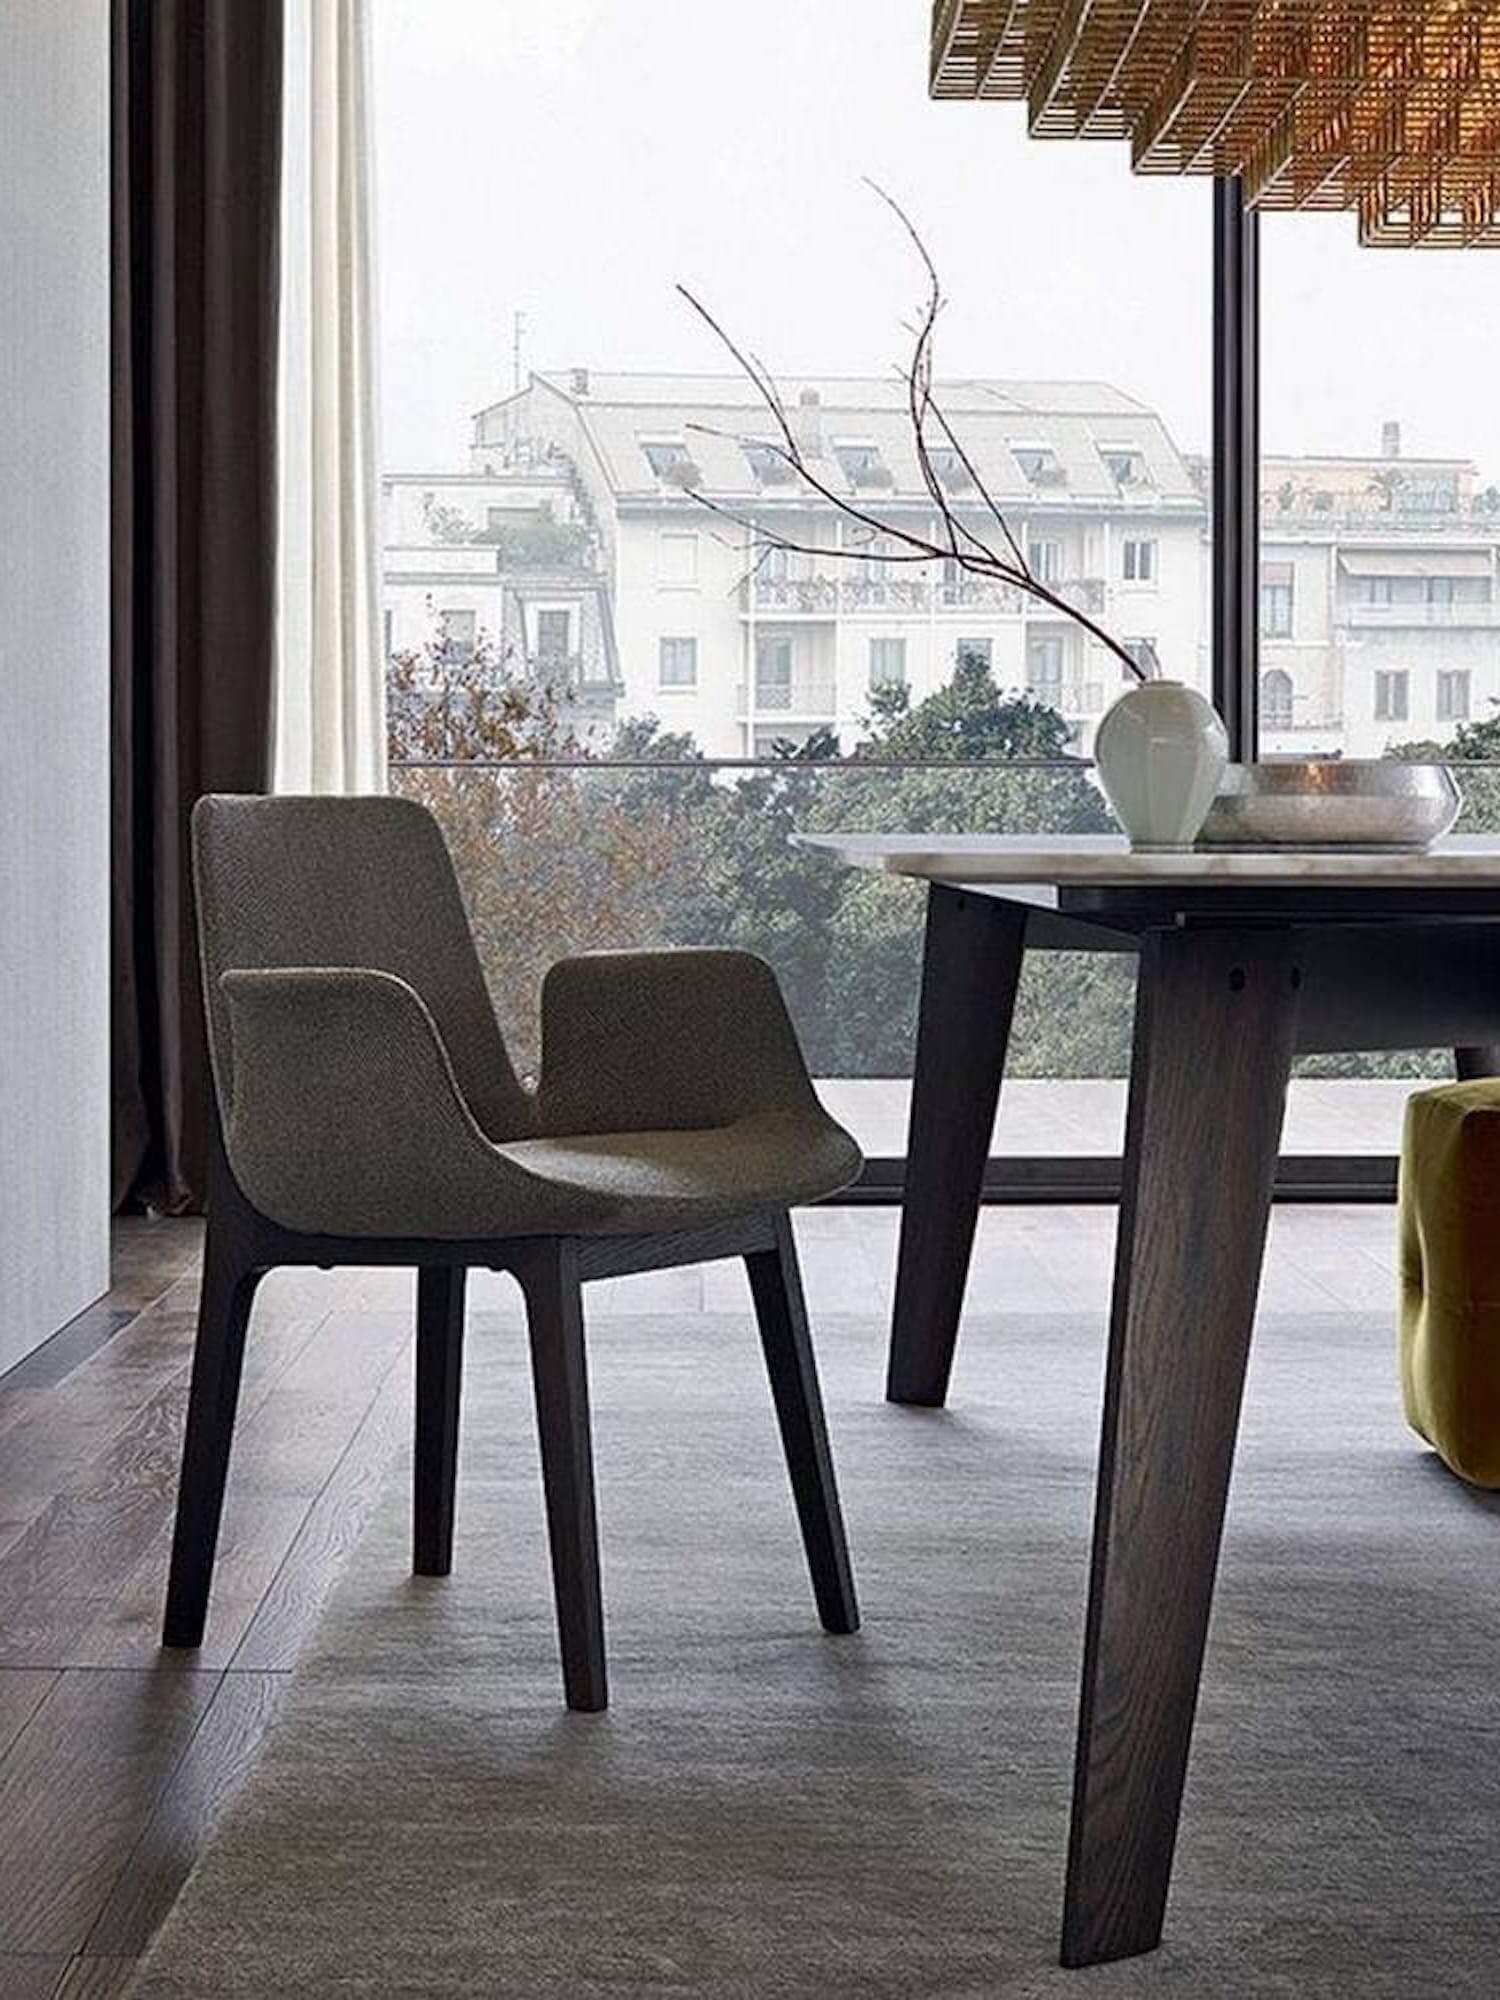 est living poliform dining howard table ventura chair arms 2